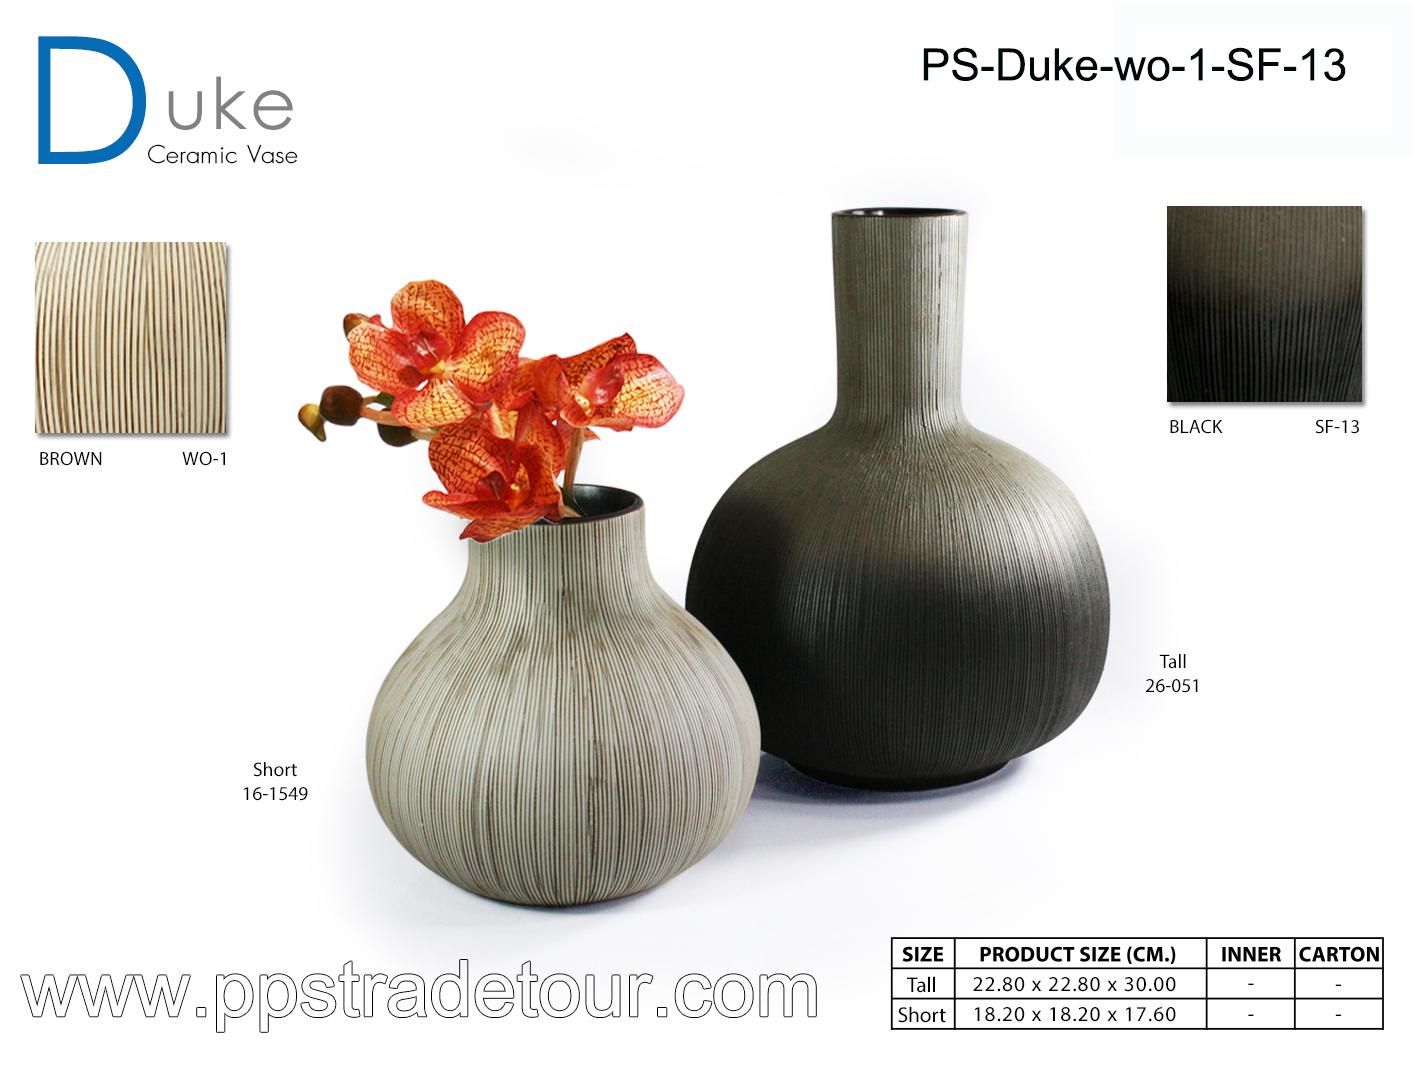 PSCV-Duke-WO-1-SF-13